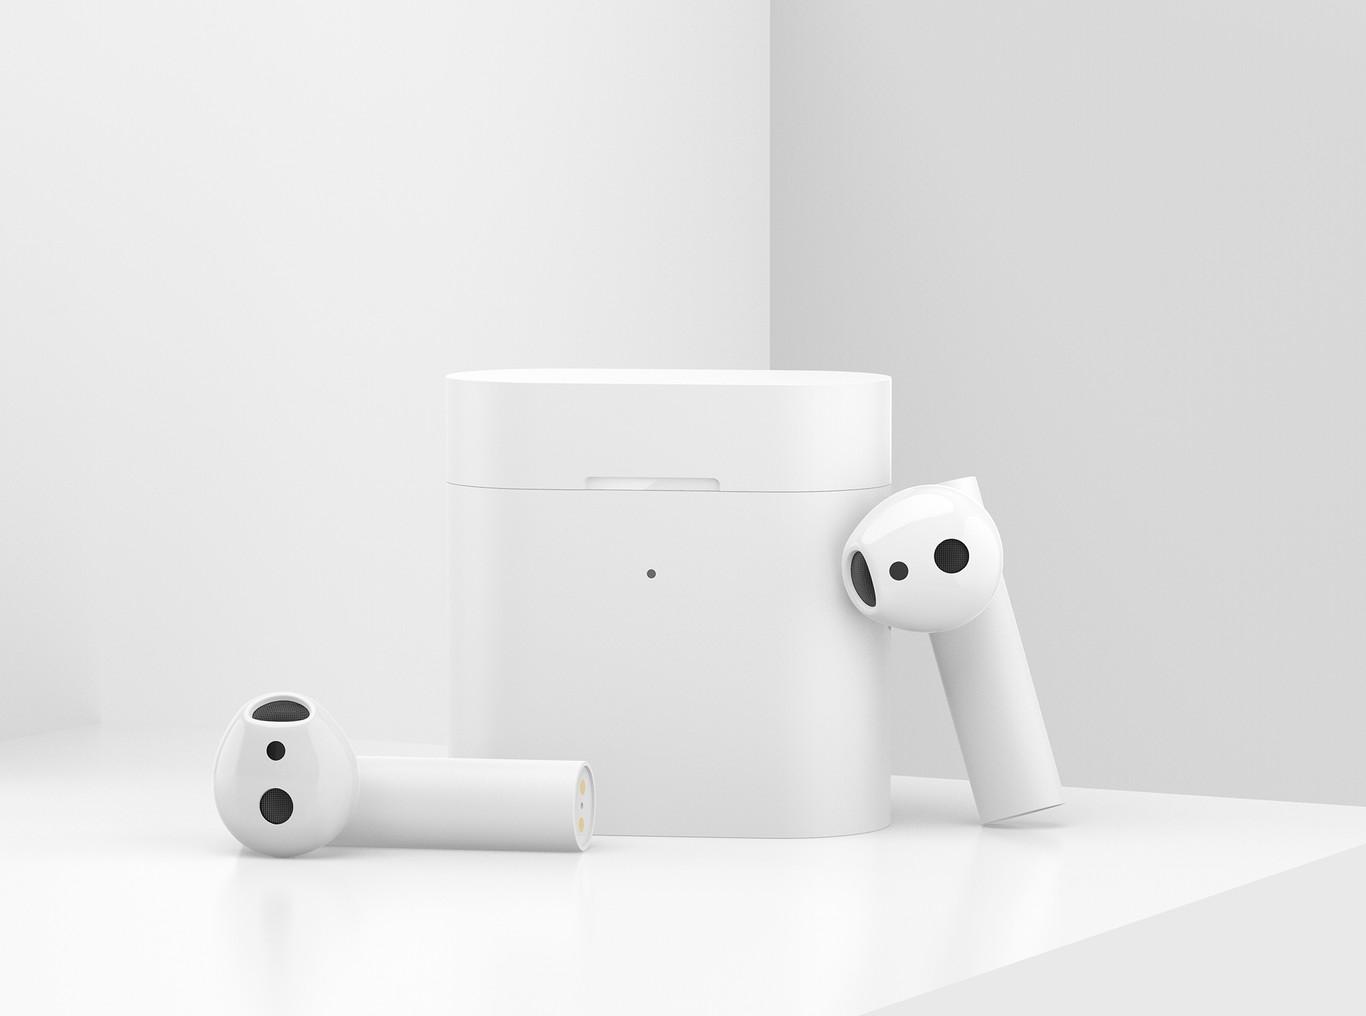 Guía de compra de auriculares verdaderamente inalámbricos con cancelación de ruido